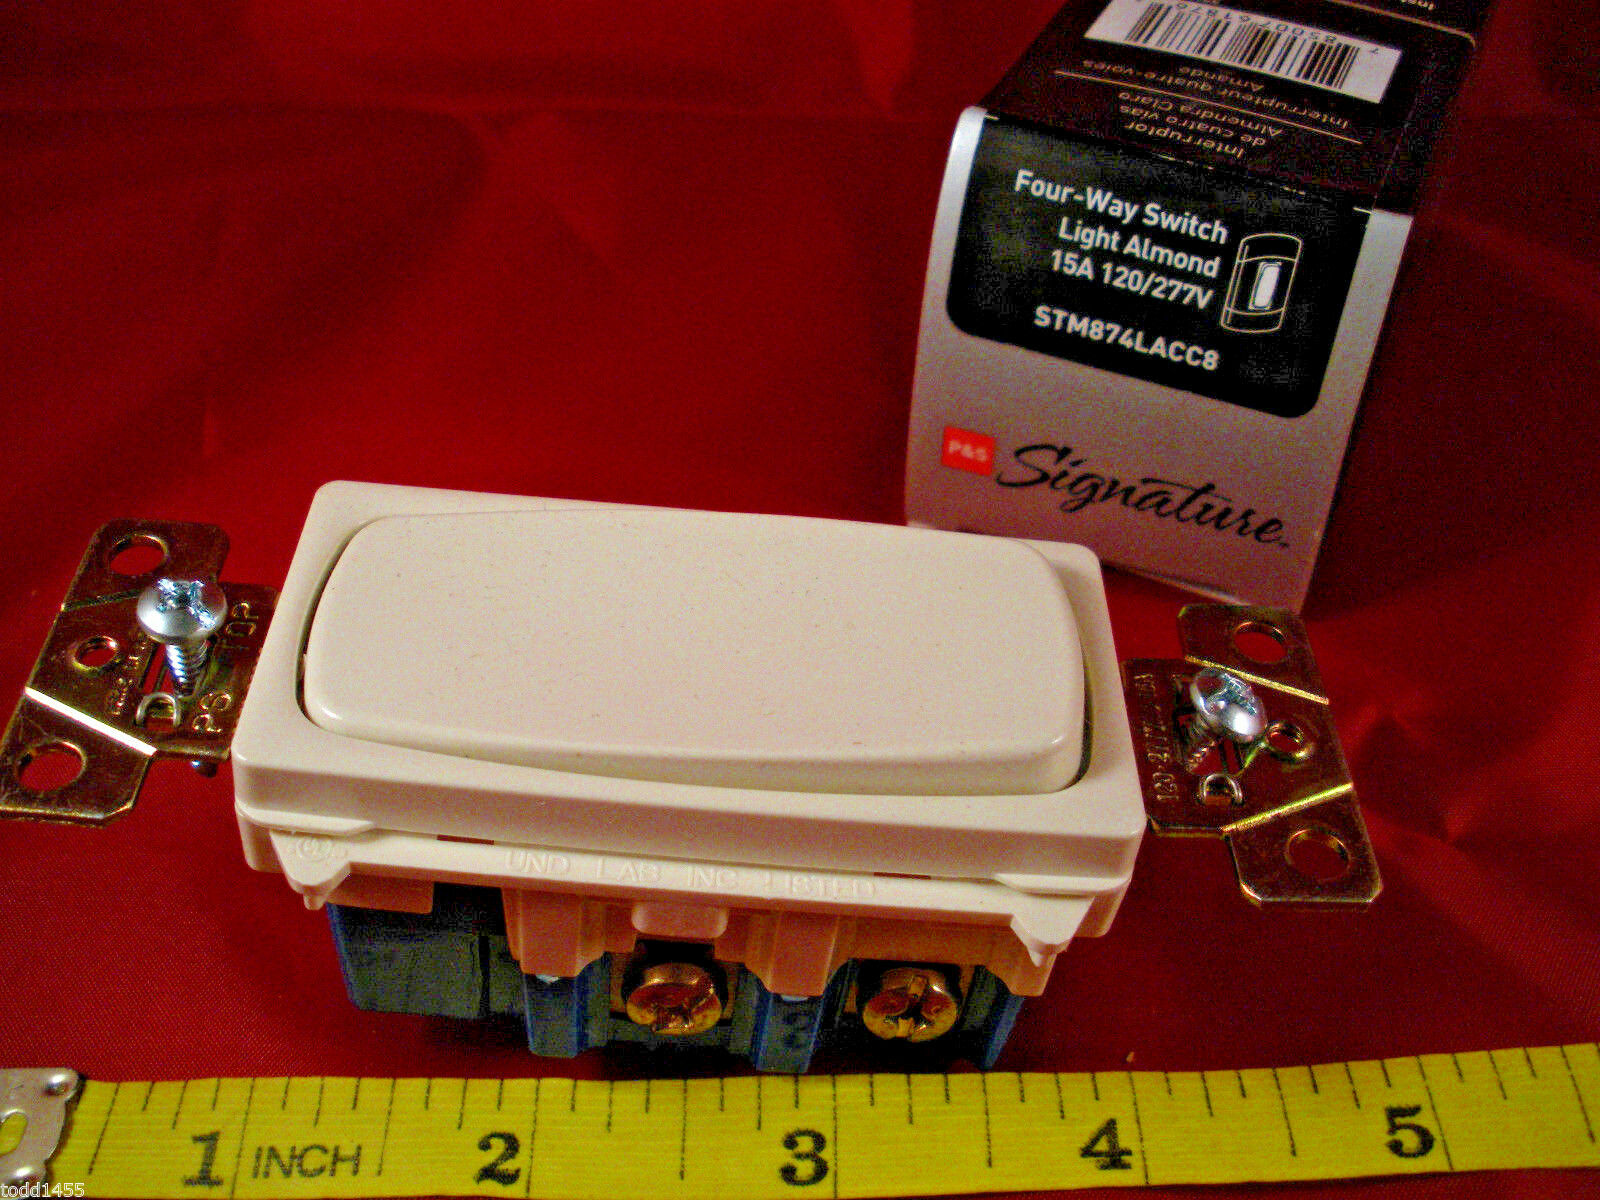 Pass Seymour 4 Way Rocker Decorator Switch Light Almond 15a 120 2 Legrand Picture 1 Of